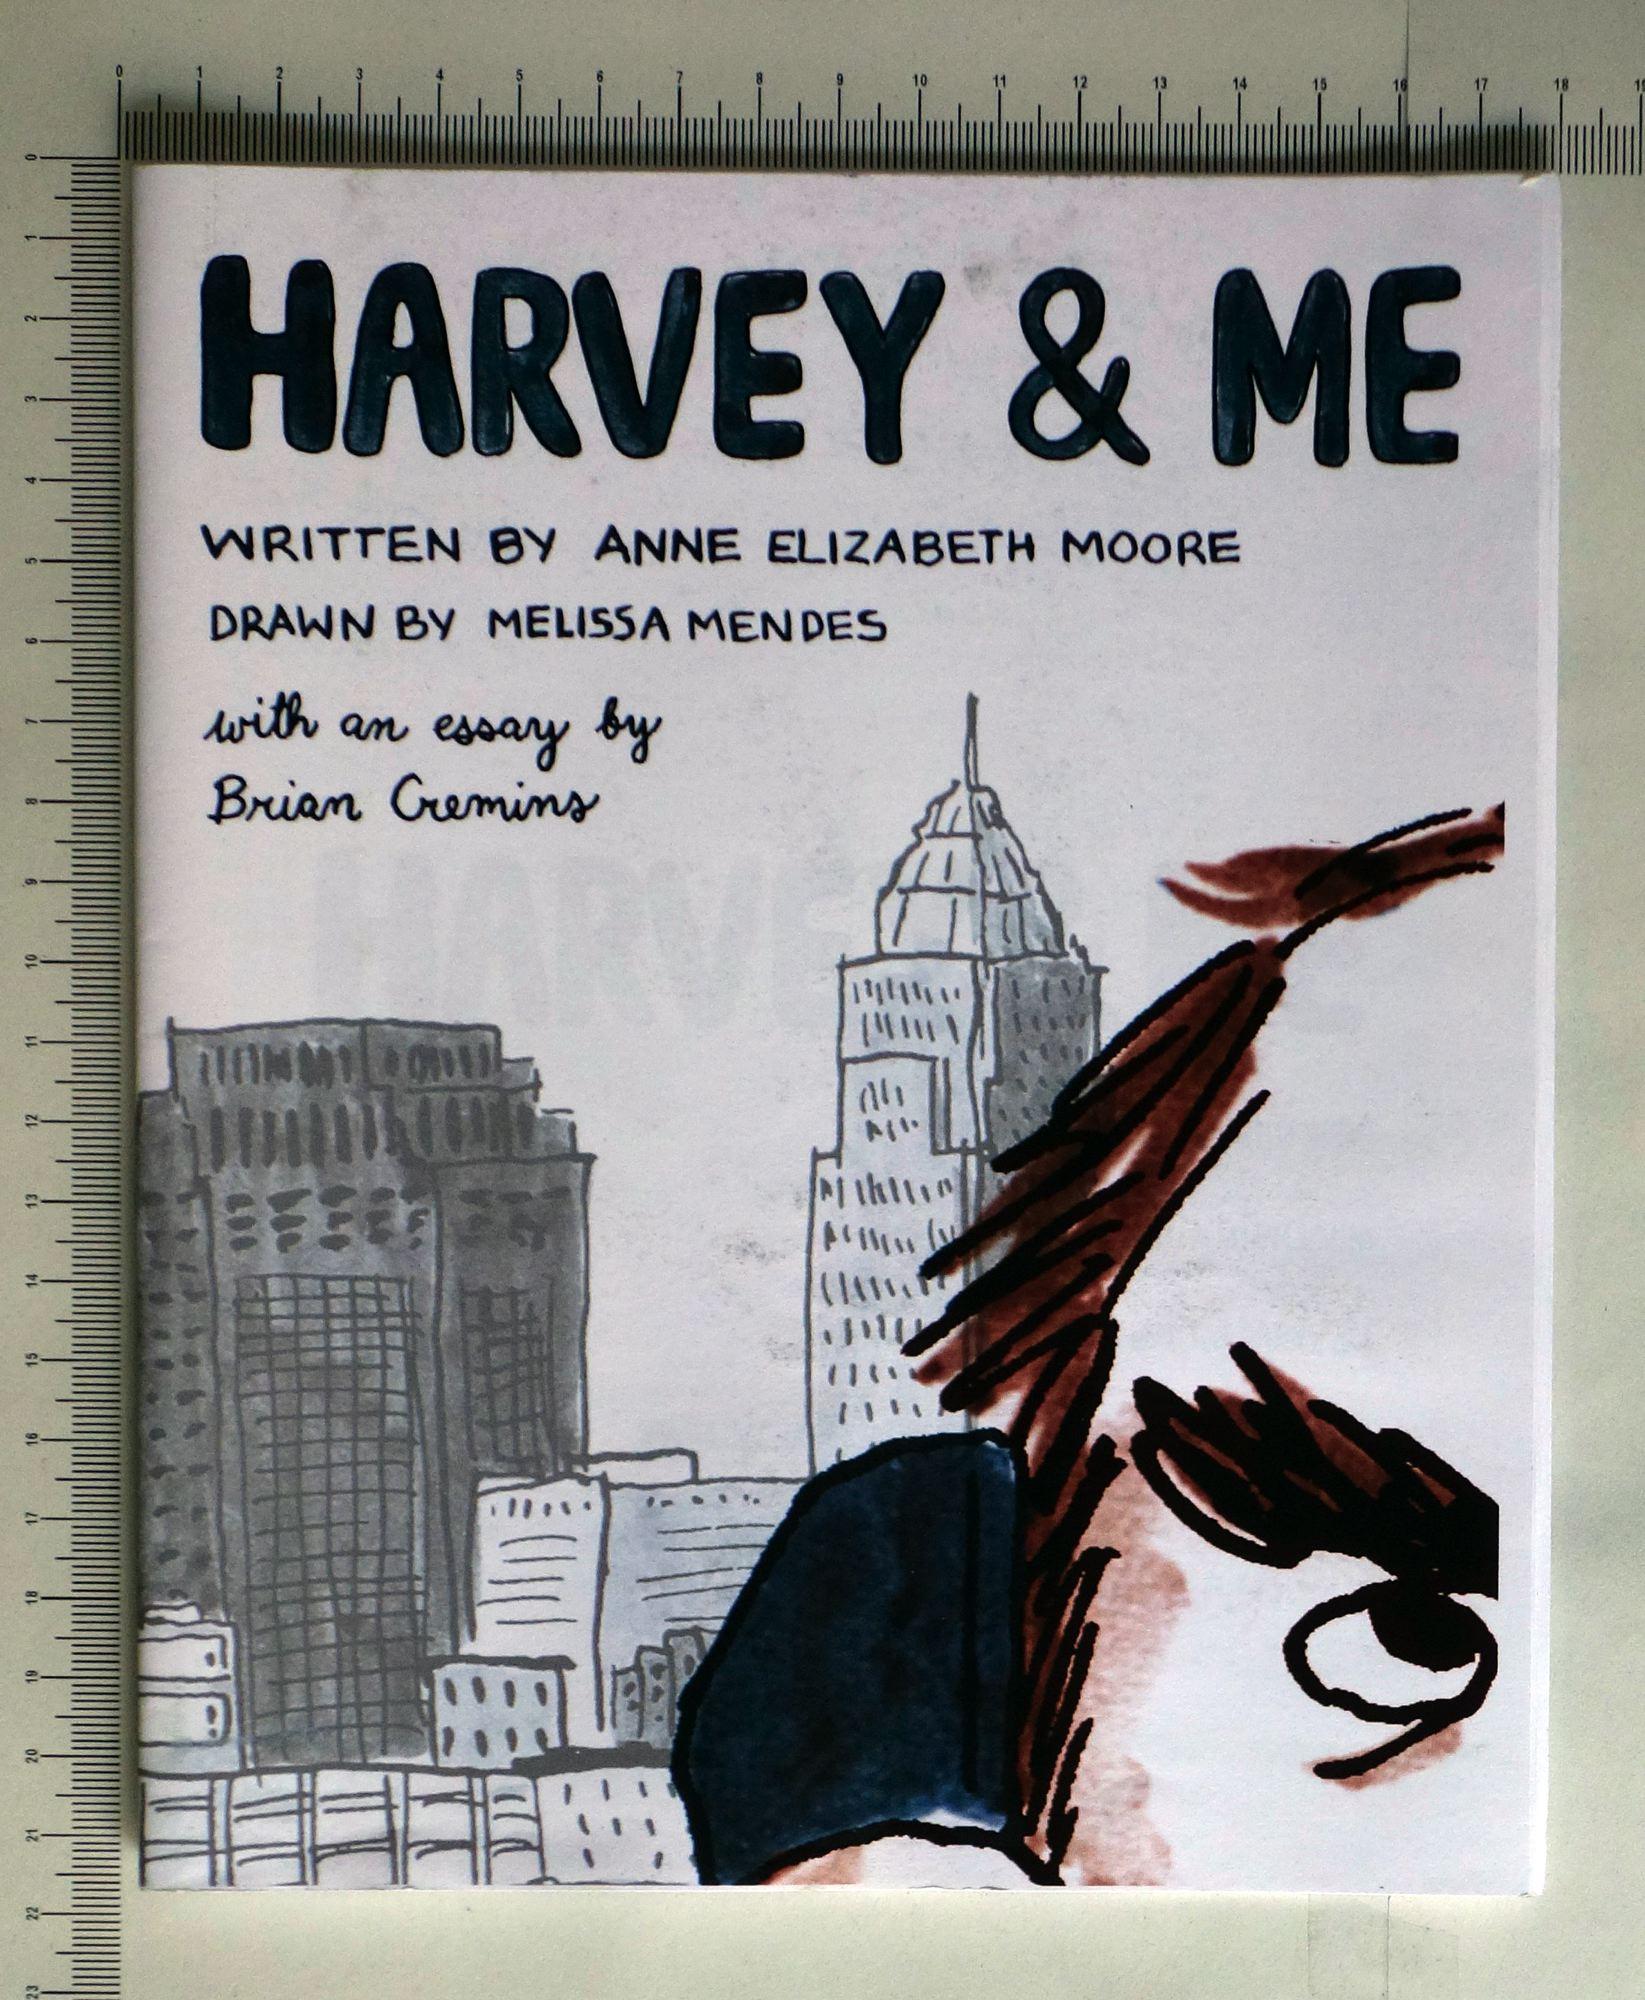 Harvey & me